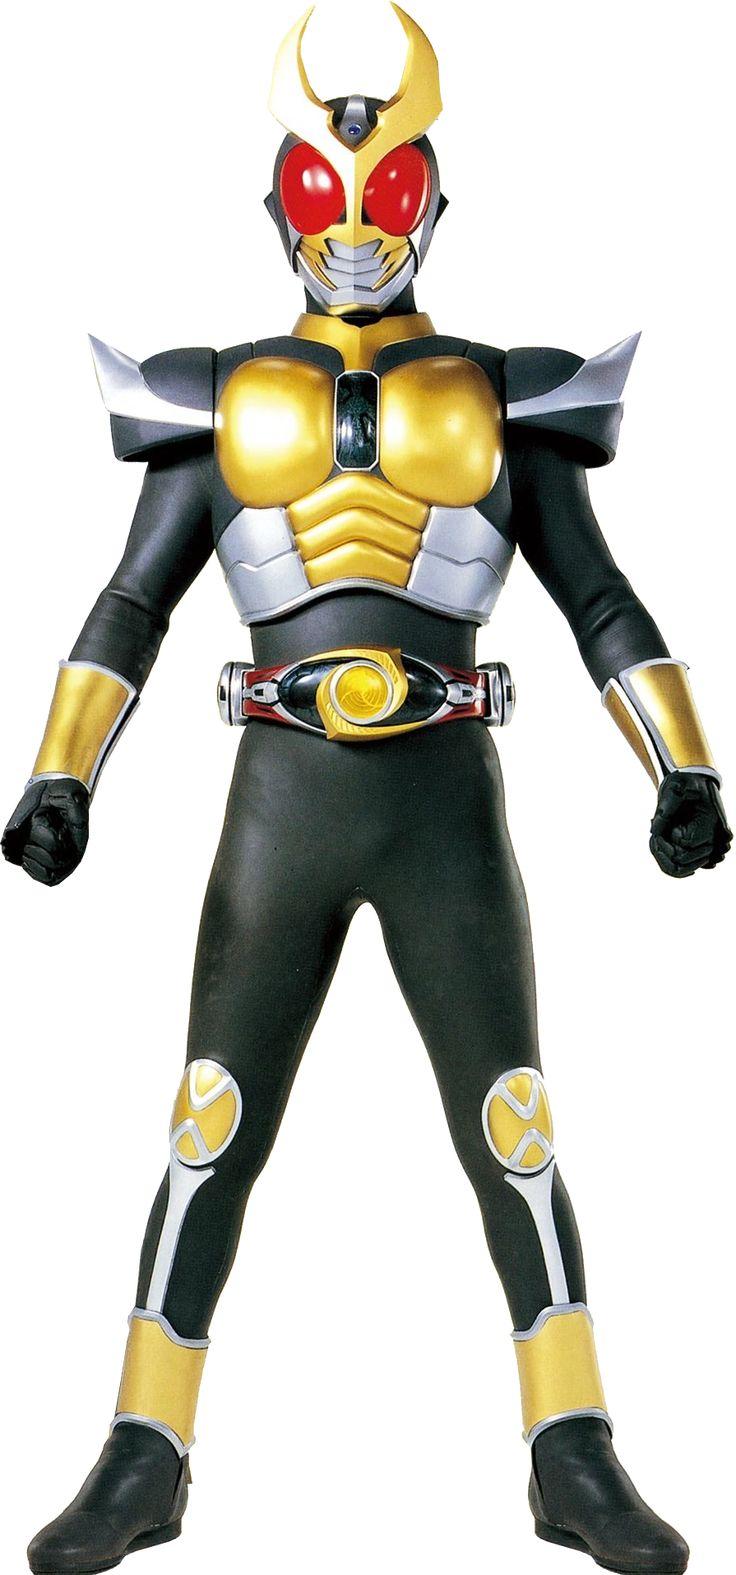 Shouichi Tsugami 画像あり アギト 仮面ライダー ライダー